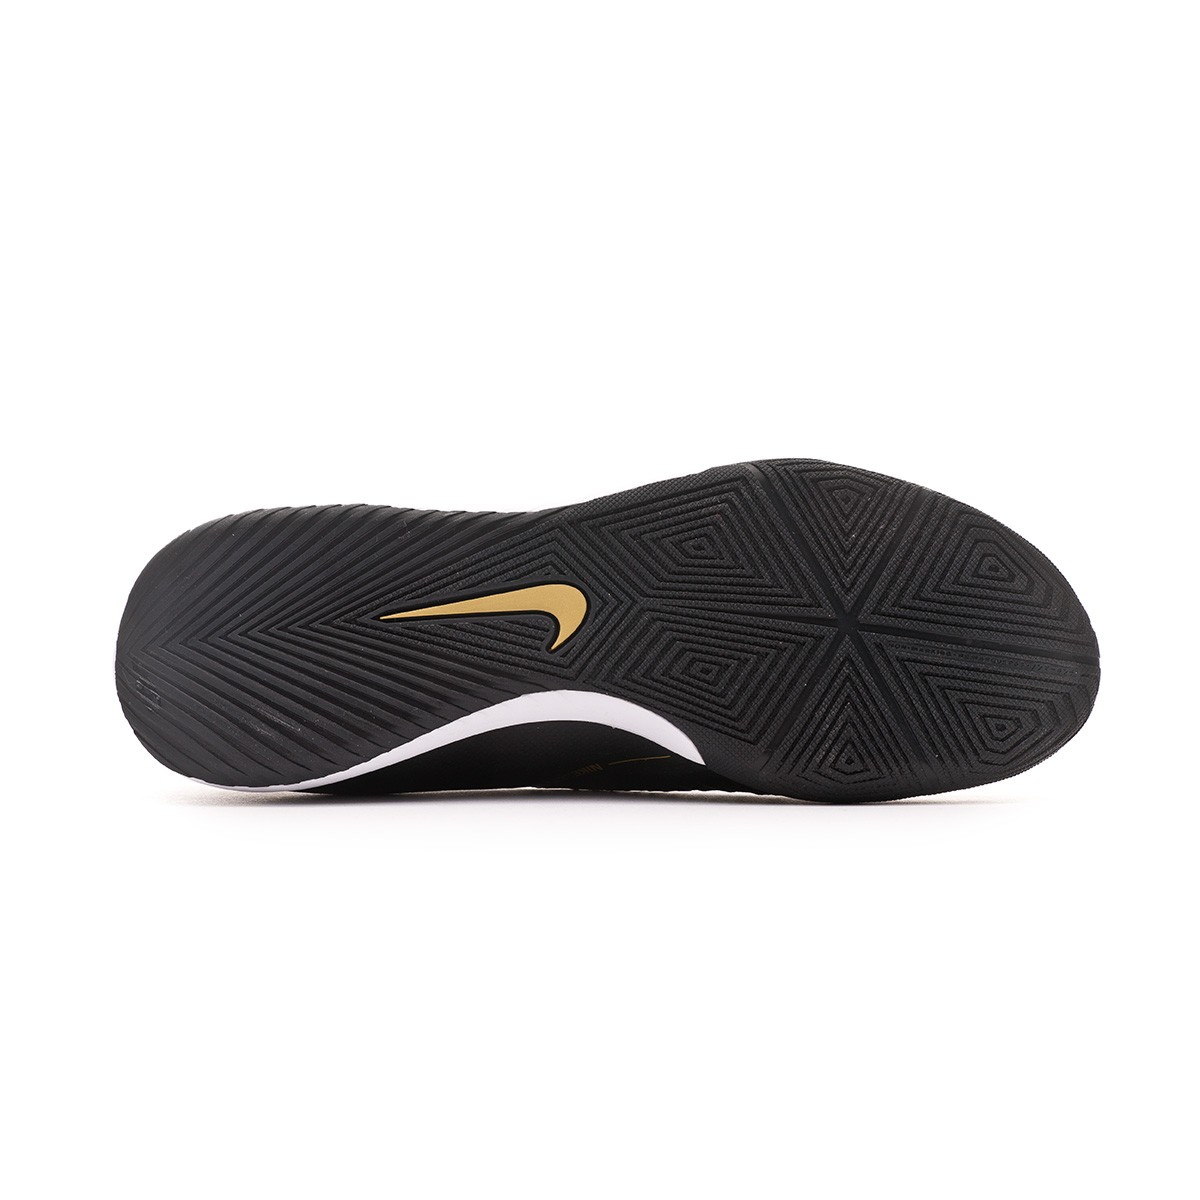 Sapatilha de Futsal Nike Phantom Venom Academy IC